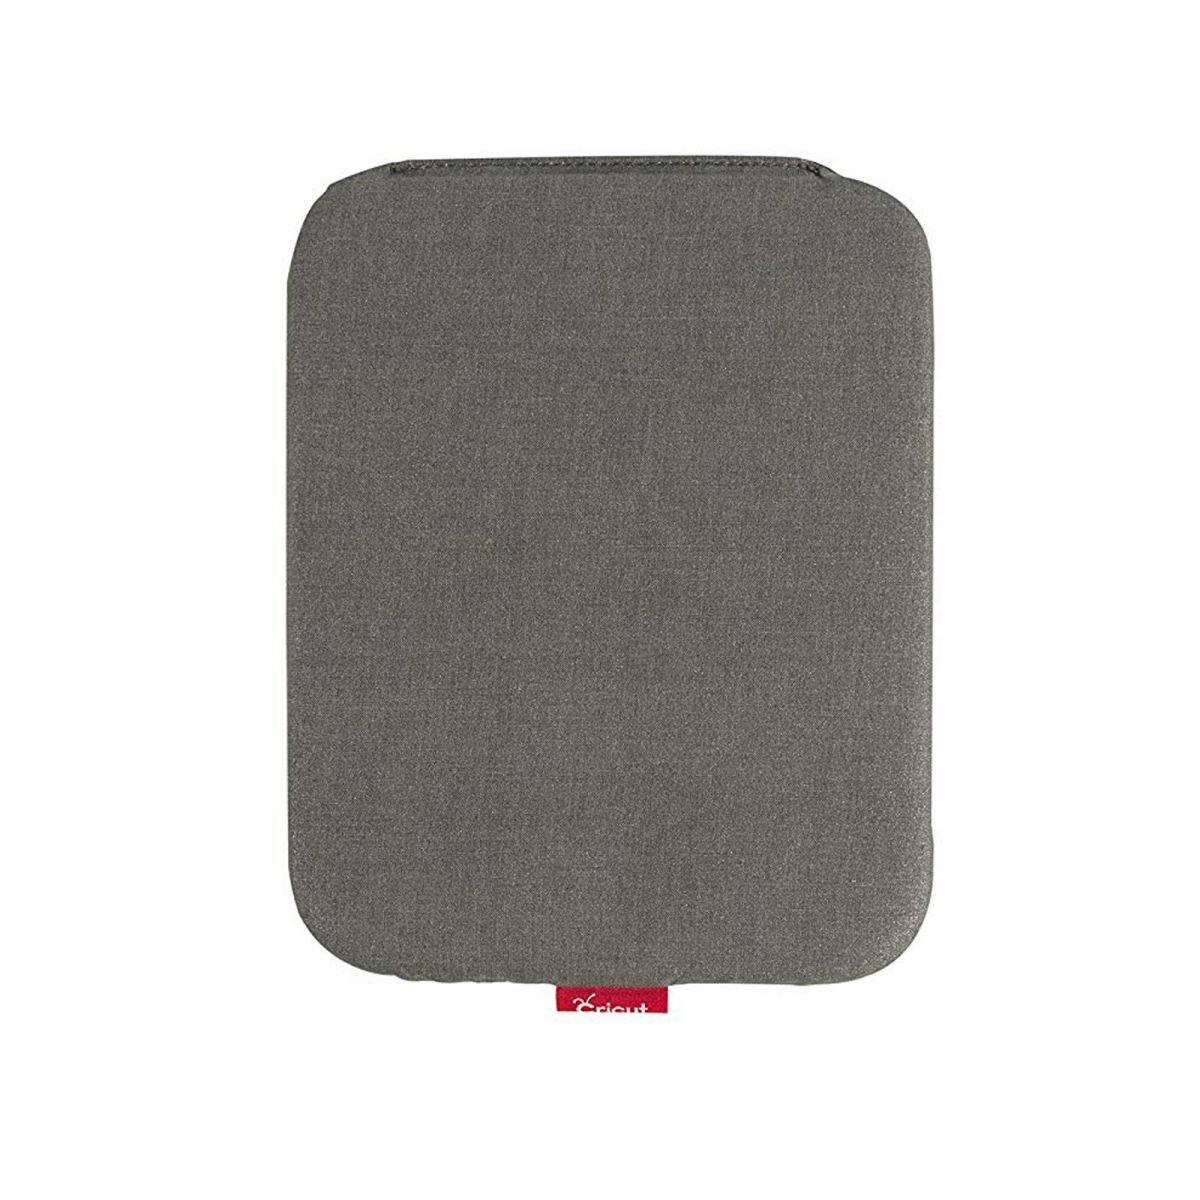 Tapis pour Easypress Cricut 20x25 cm